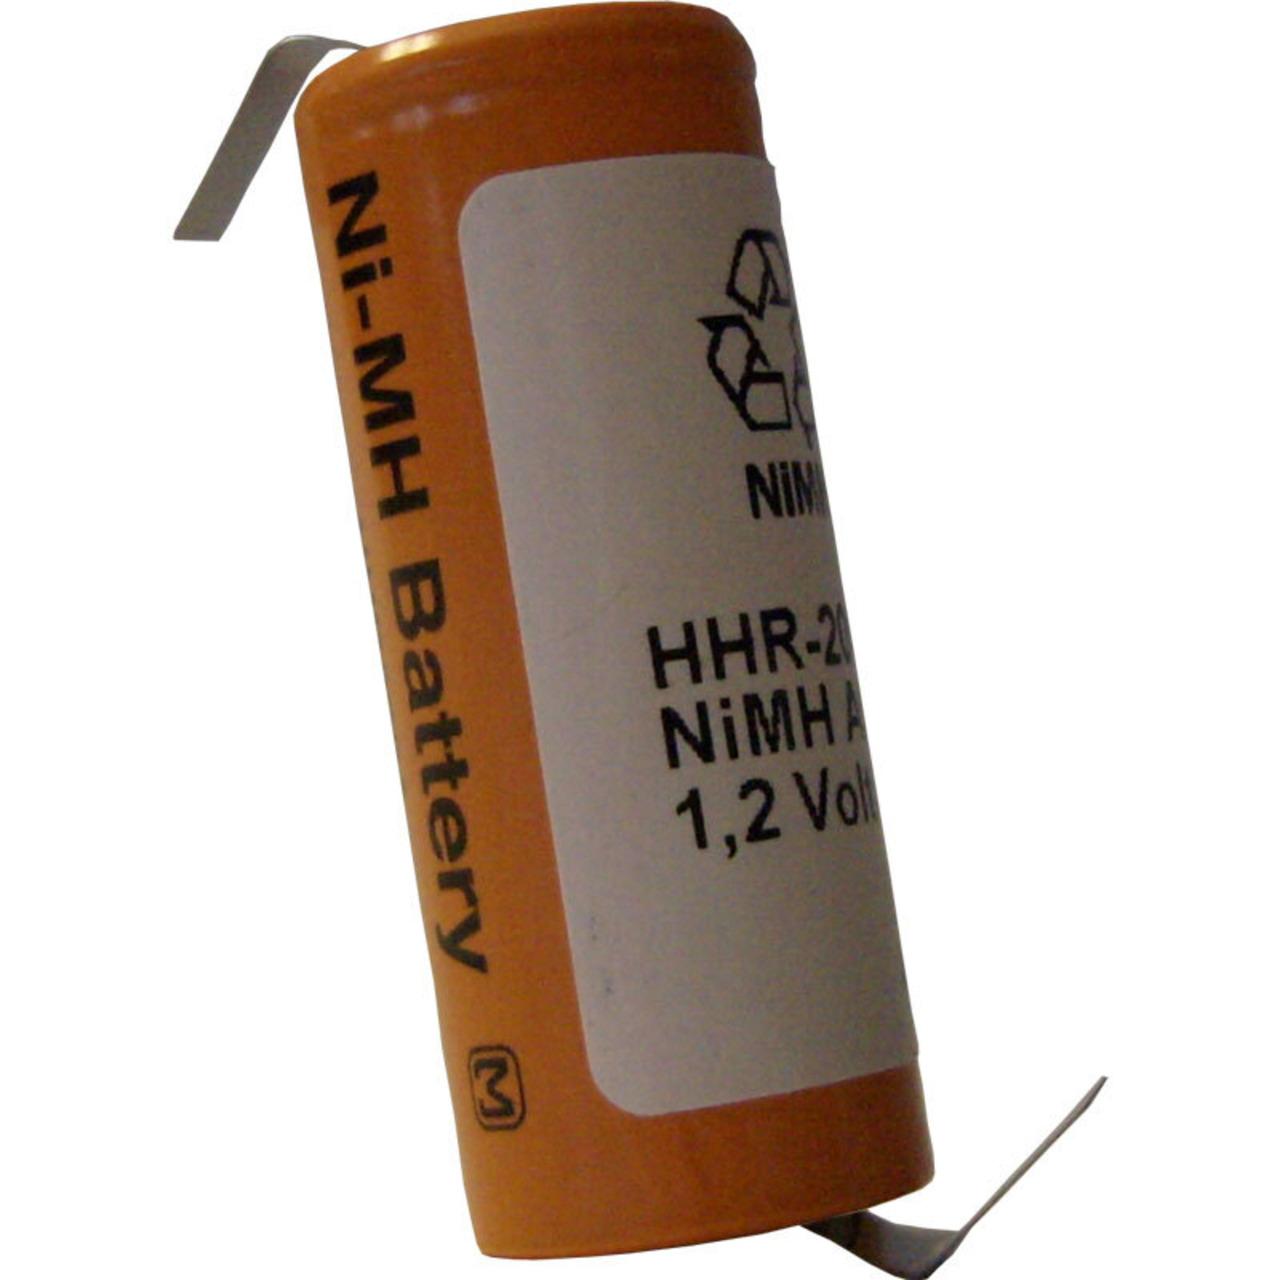 Panasonic NiMH-Zelle mit Lötfahne HHR-200AB01-1Z- 2000 mAh